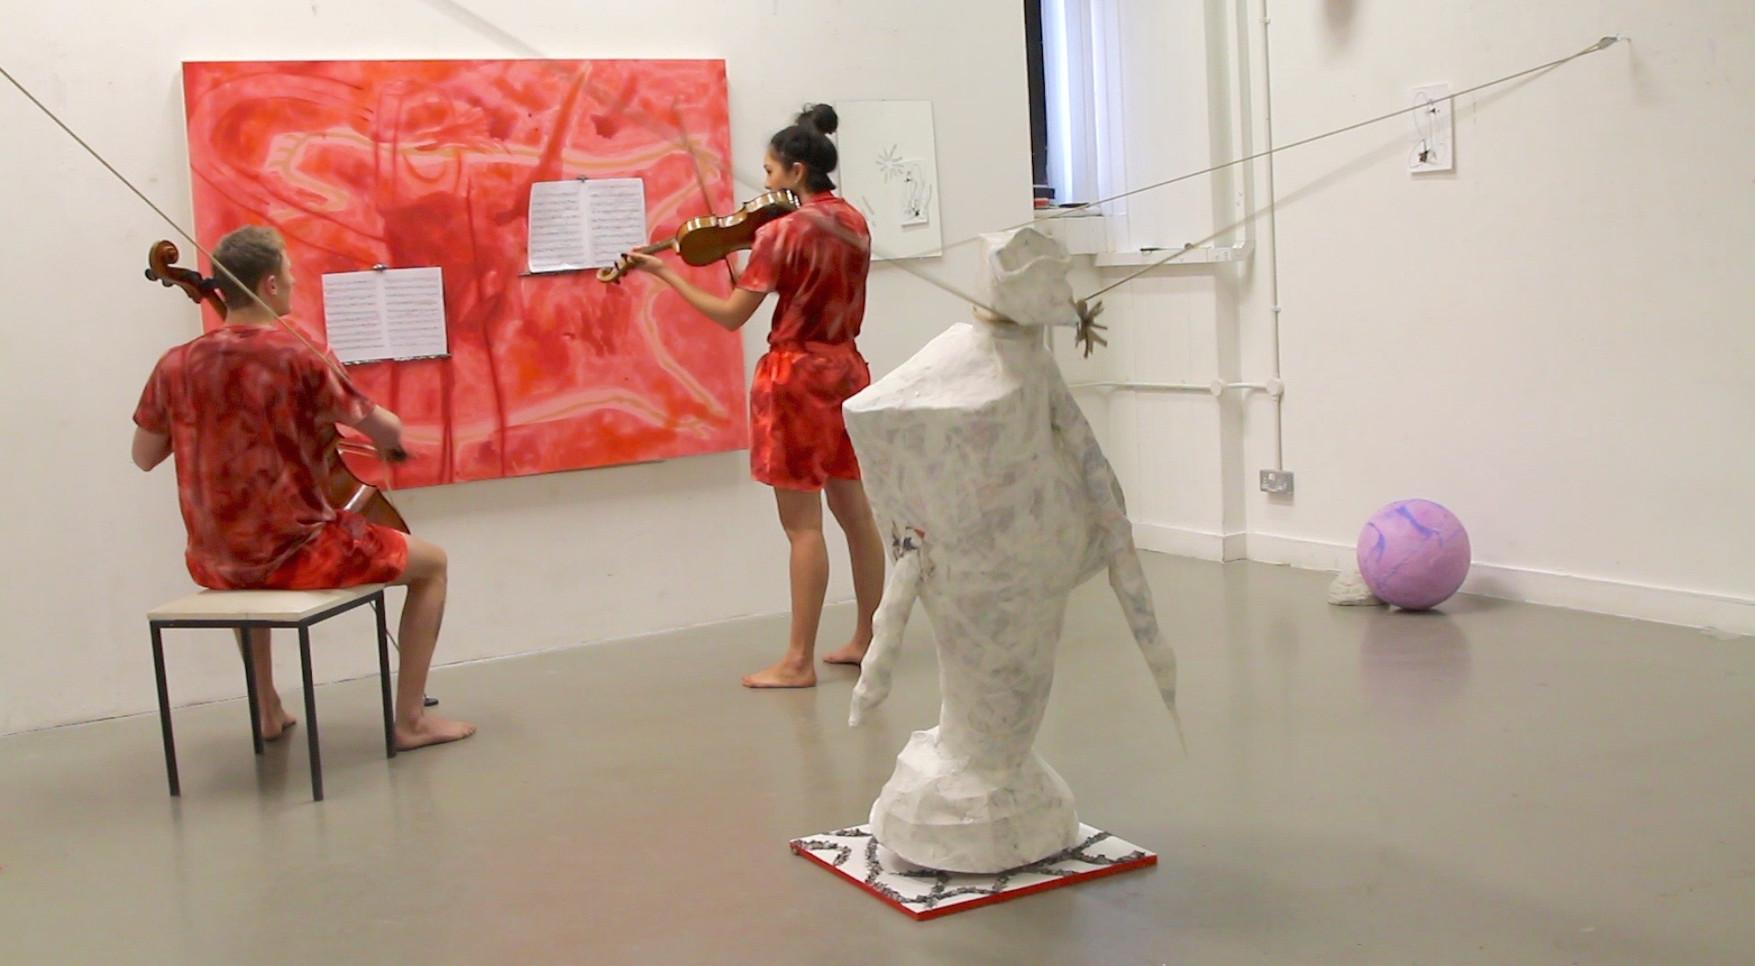 Eleanor Wang, Grotesque, 2016. Performance